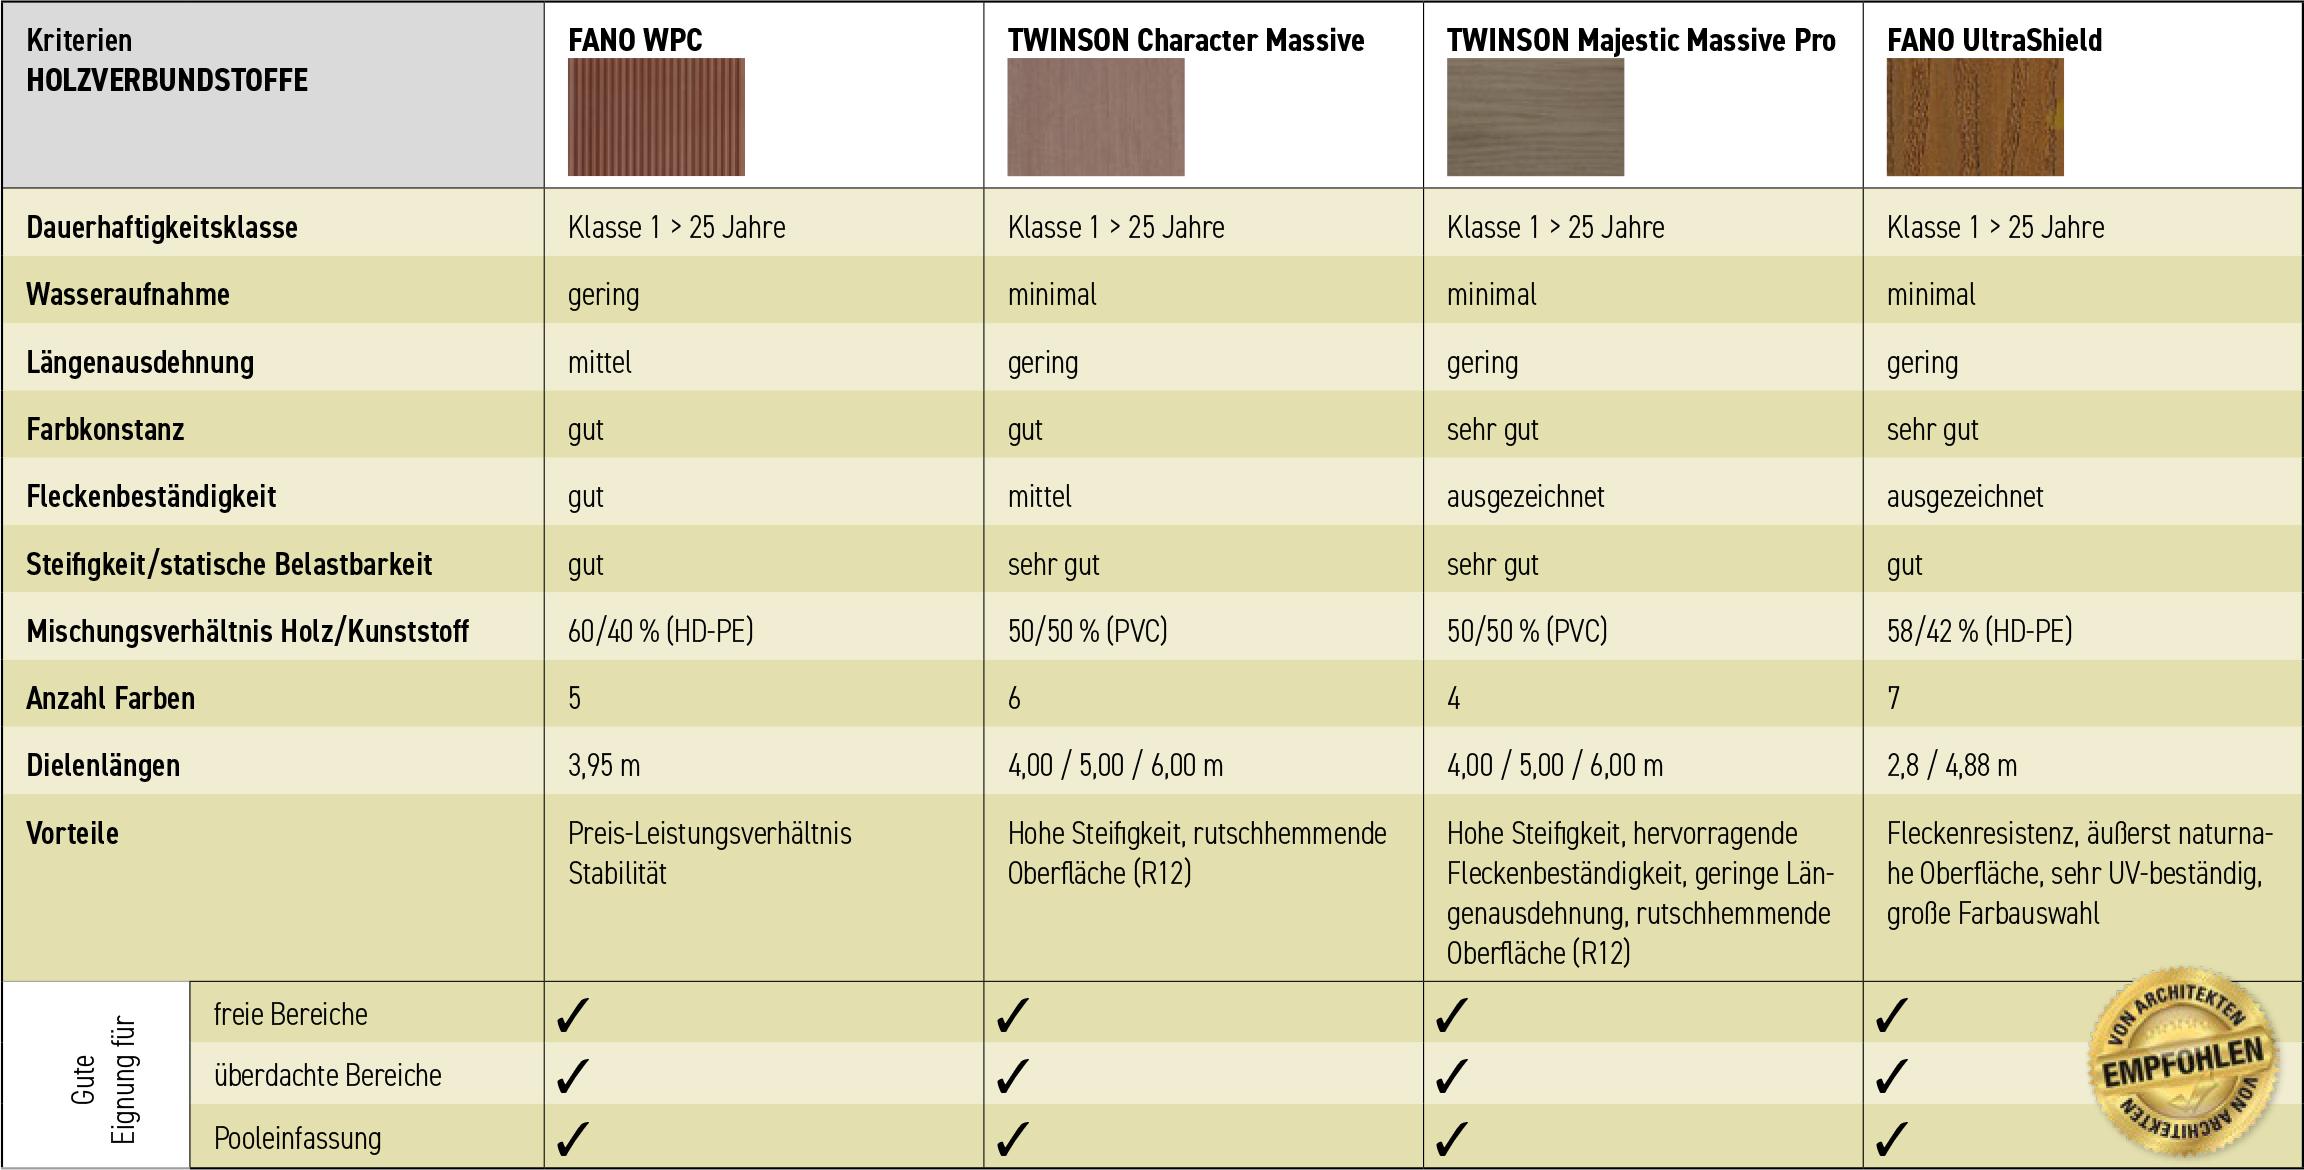 bersicht-Lebensdauer-WPC-TerrassendielenV1Ozhl4s2V7To